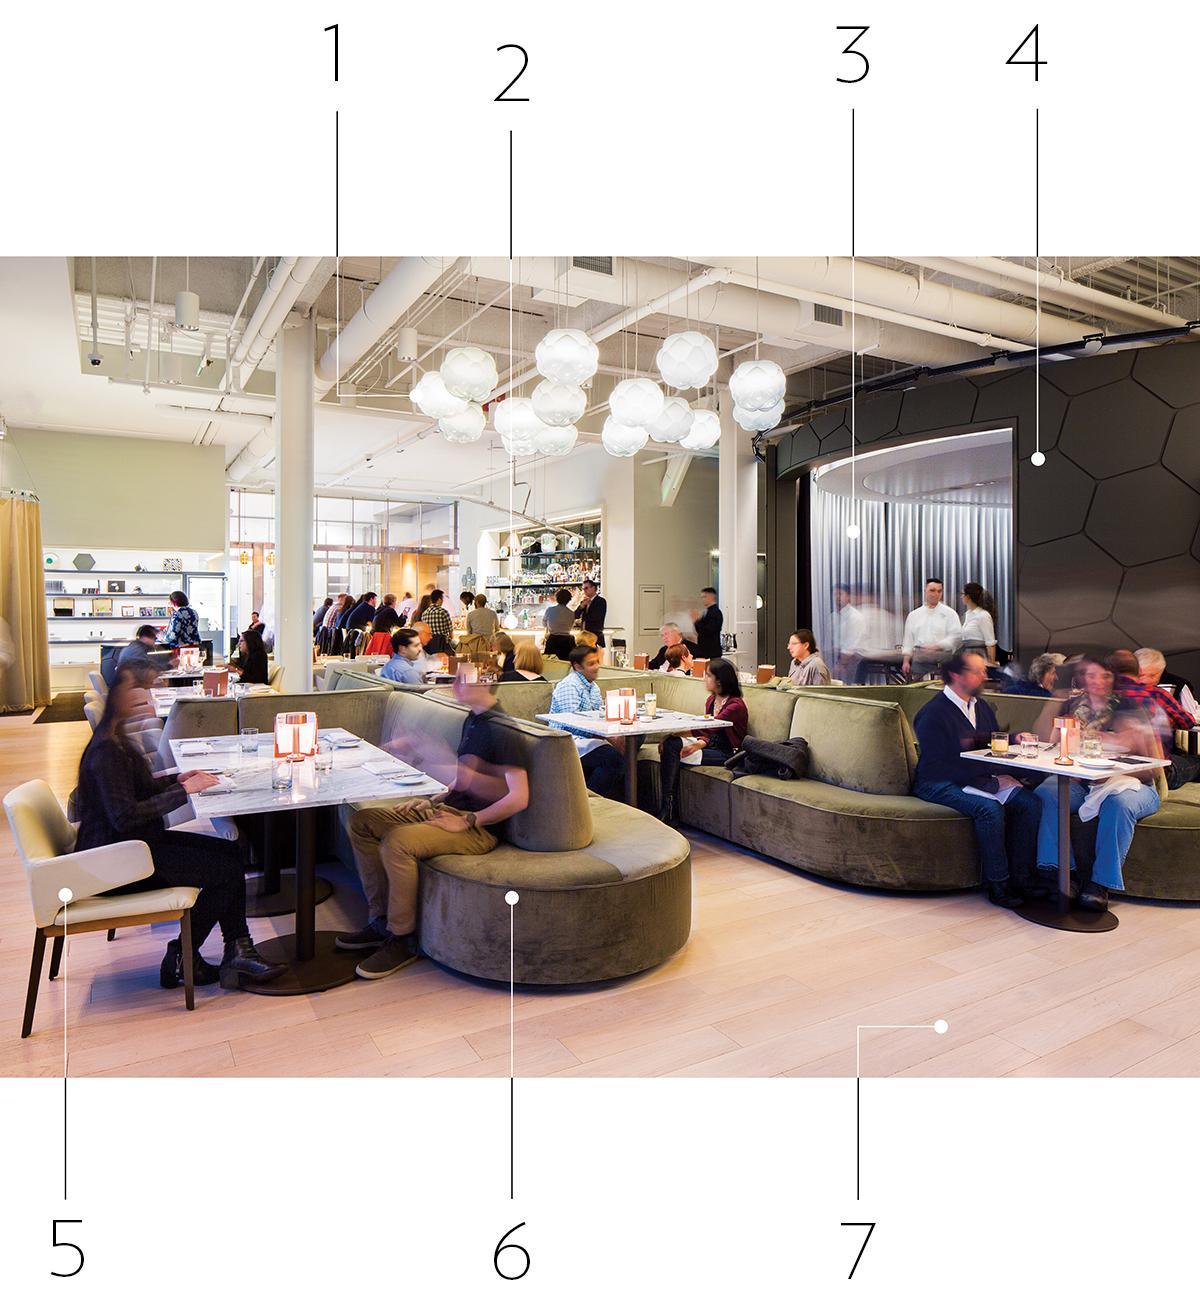 cafe artscience